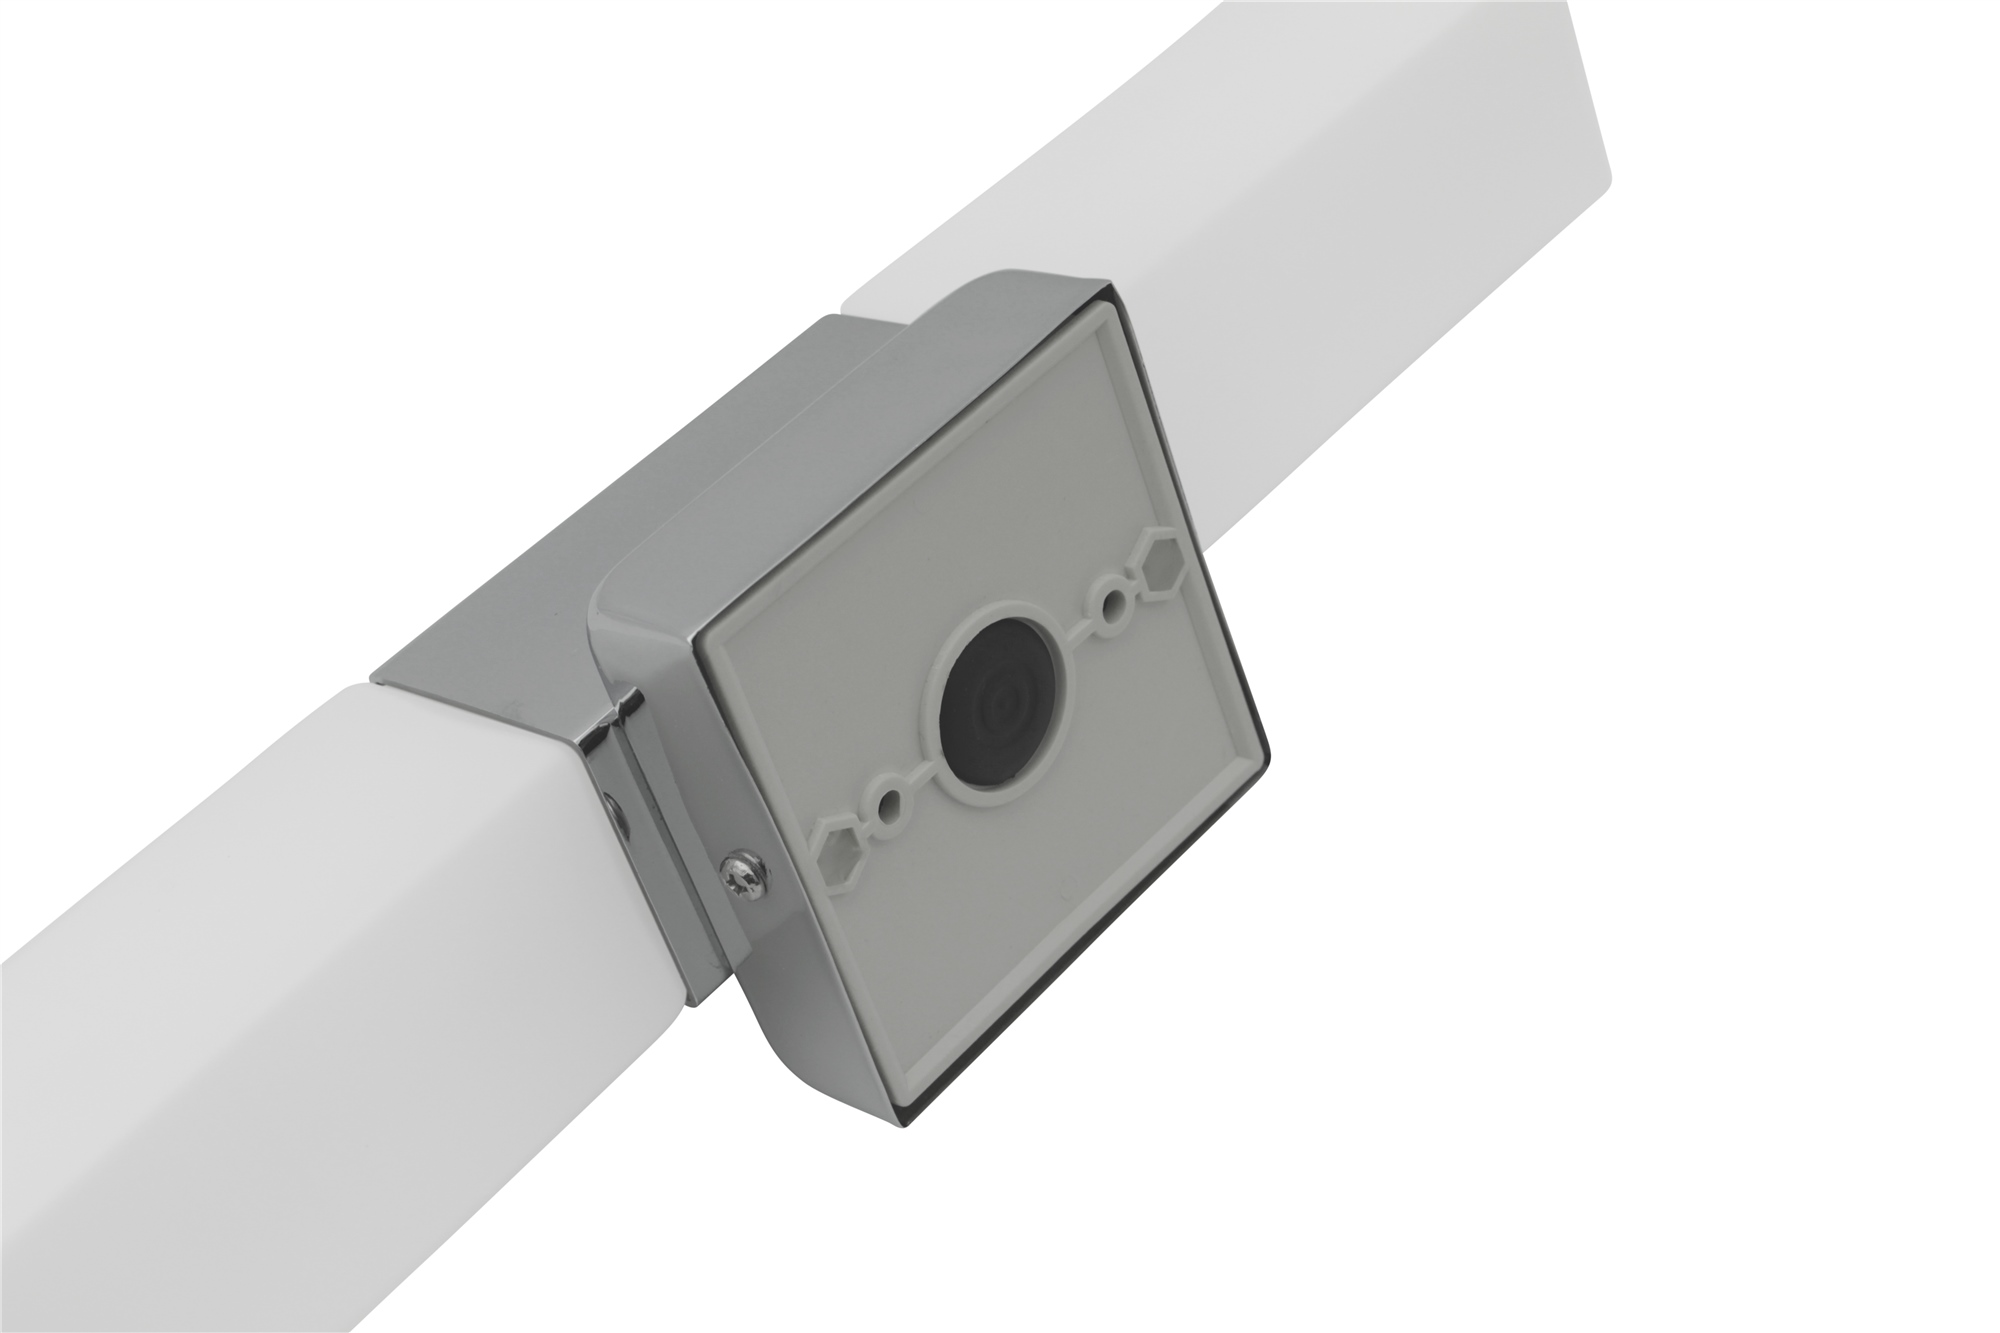 Lampenlux LED Wandlampe Akin Wandleuchte Spiegelleuchte Badleuchte 2flammig Alu 230V IP44